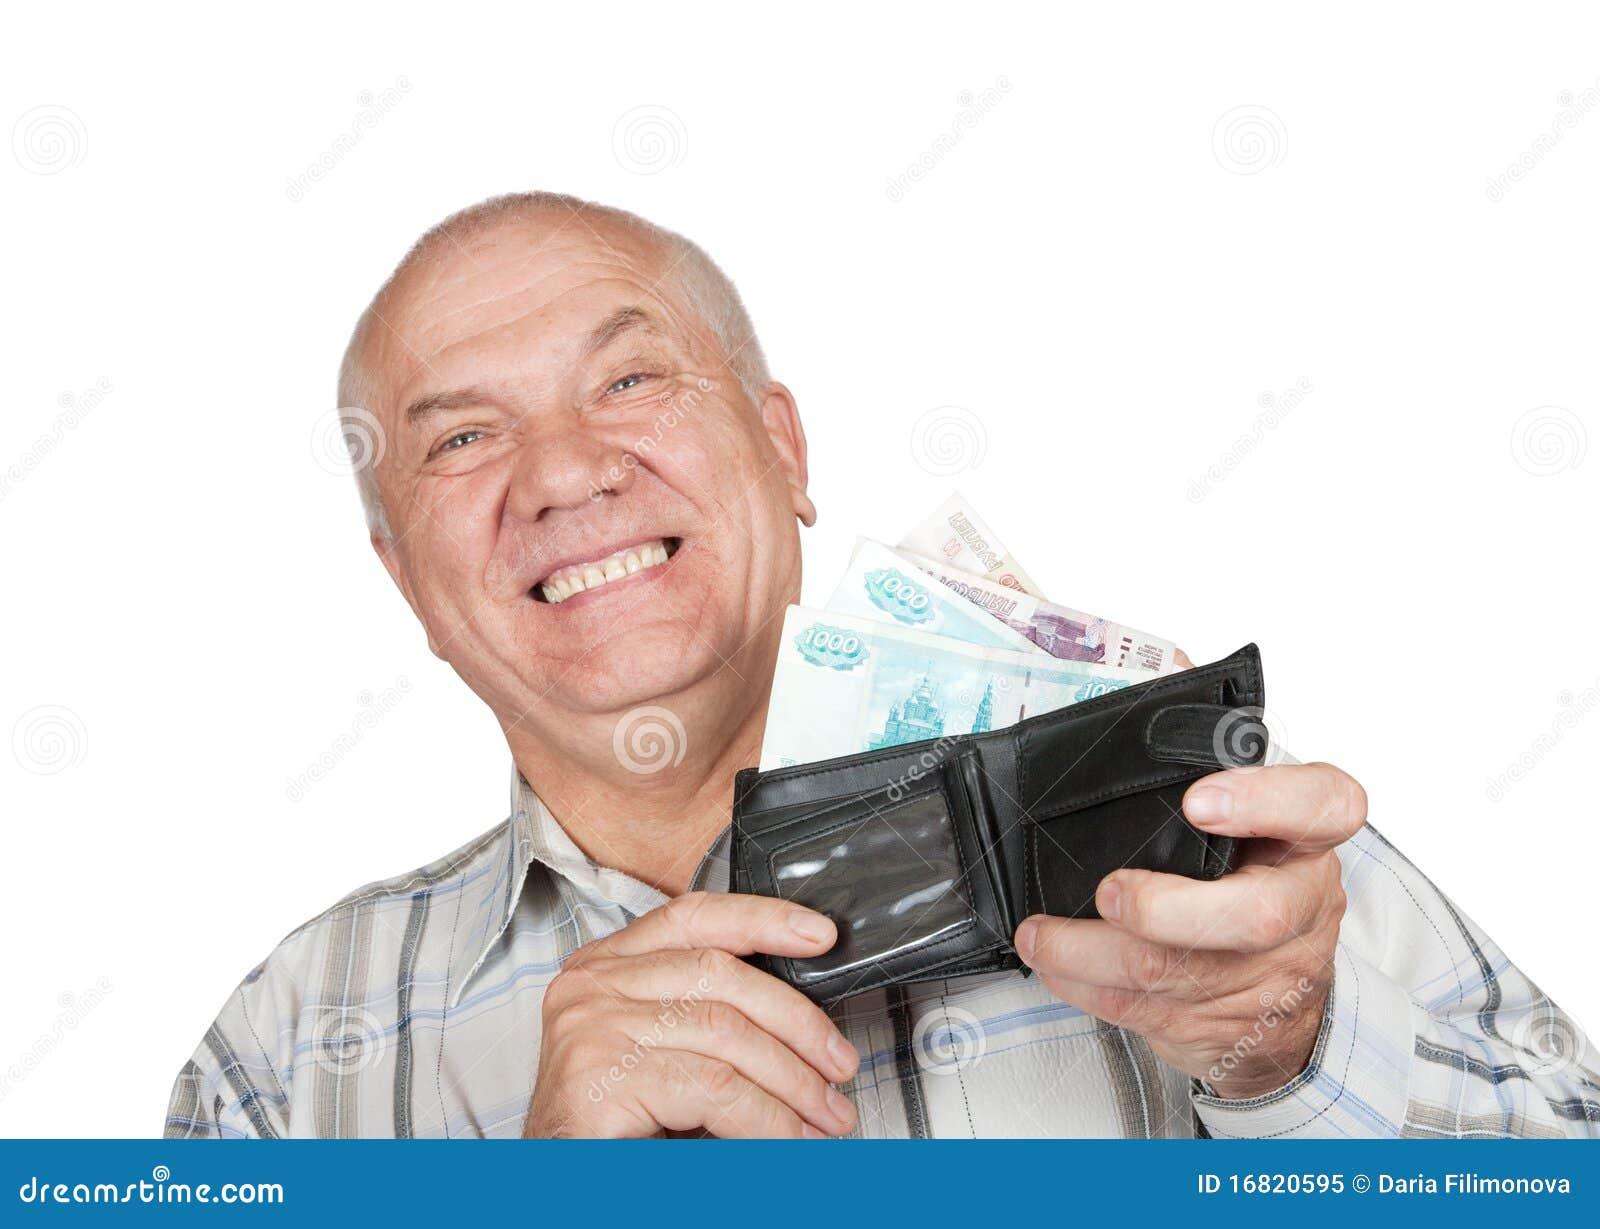 happy-man-money-16820595.jpg